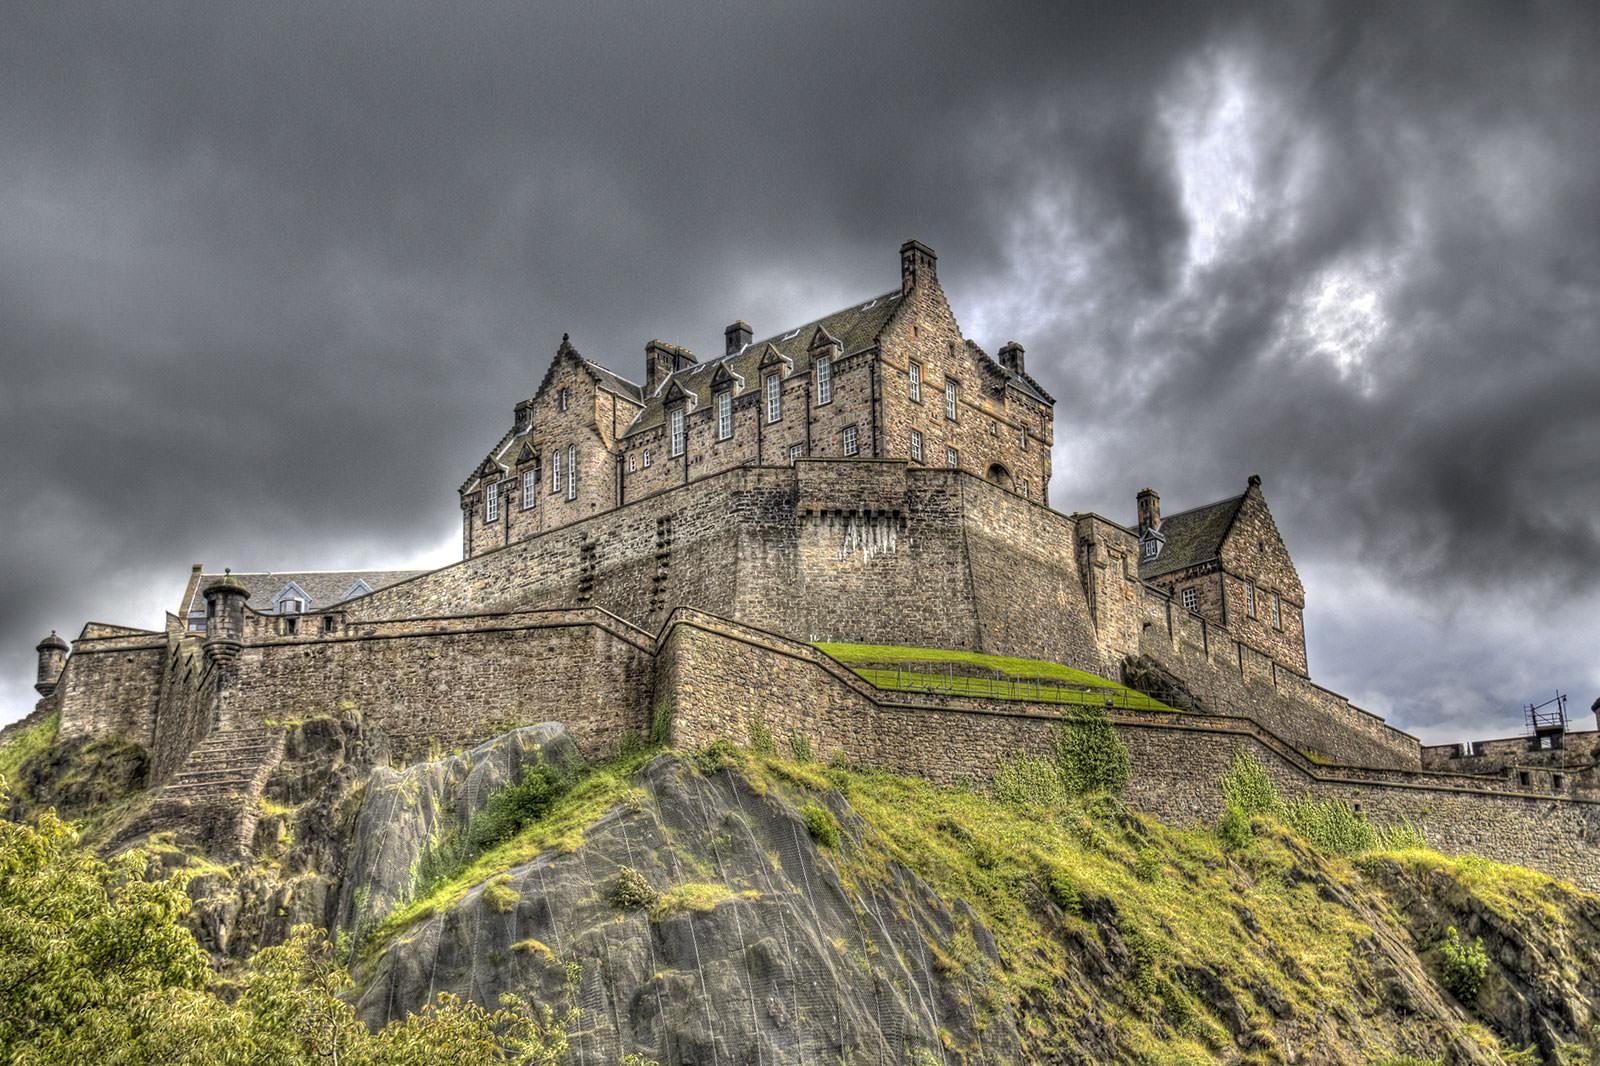 6 Creepy Stories from Edinburgh to Freak You Out - Edinburgh